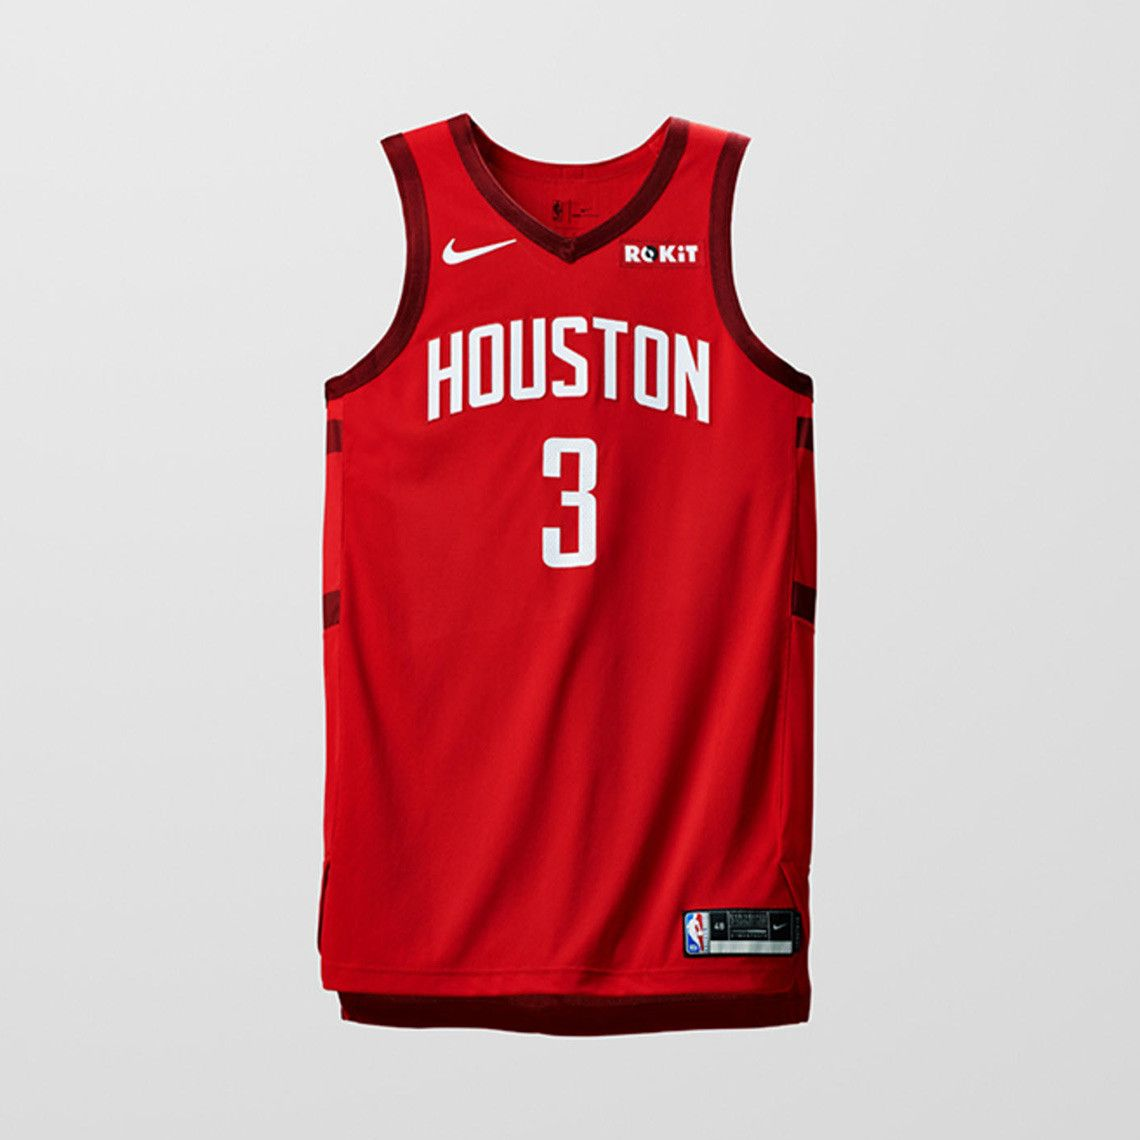 Nike Nba Earned Edition Jersey Sneakernews Com Basketball T Shirt Designs Basketball Uniforms Design Nba